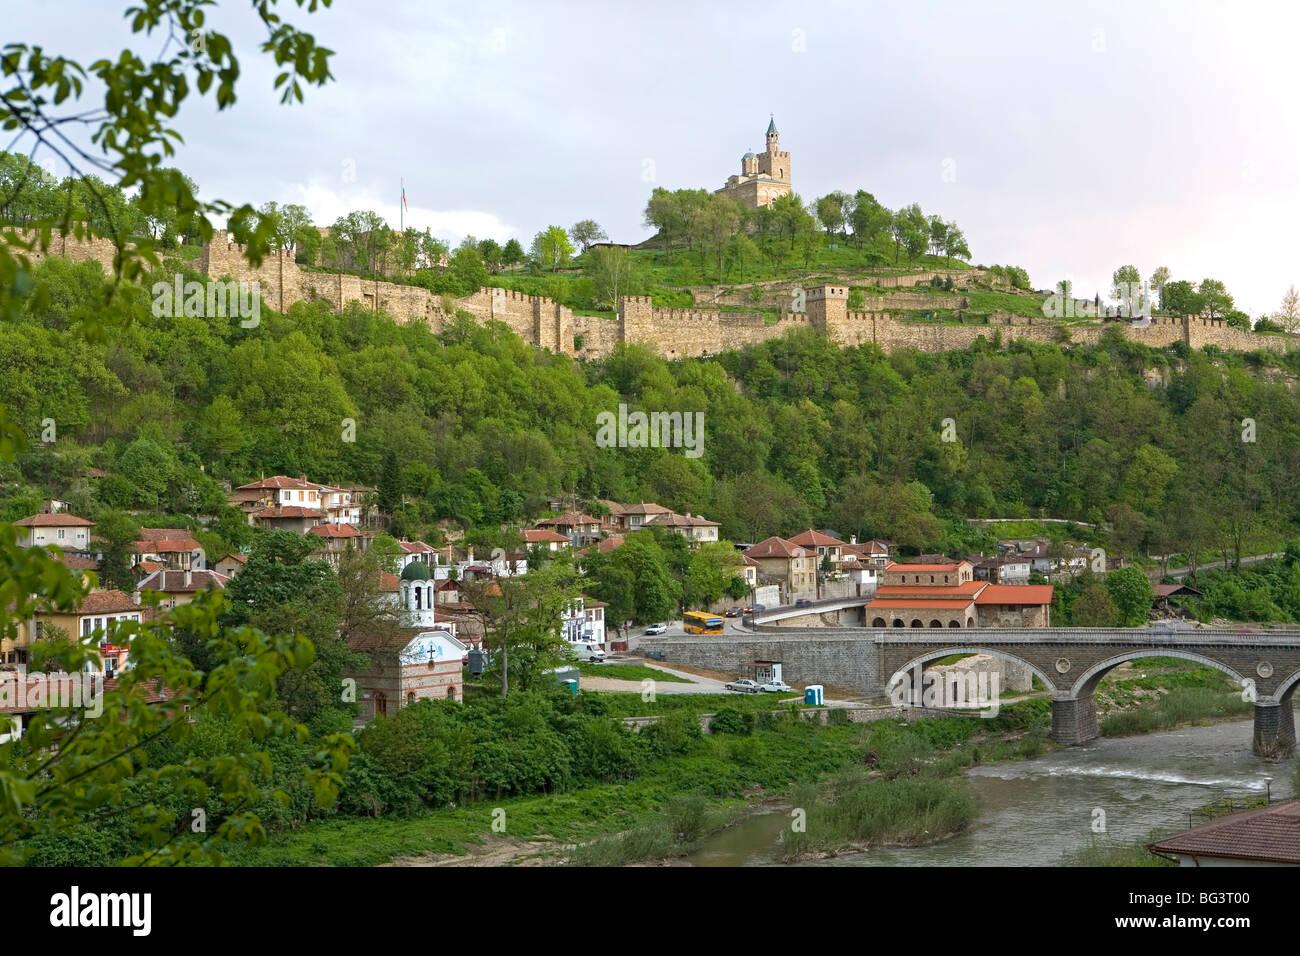 Tsarevets fortress, Veliko Tarnovo, Bulgaria, Europe Stock Photo